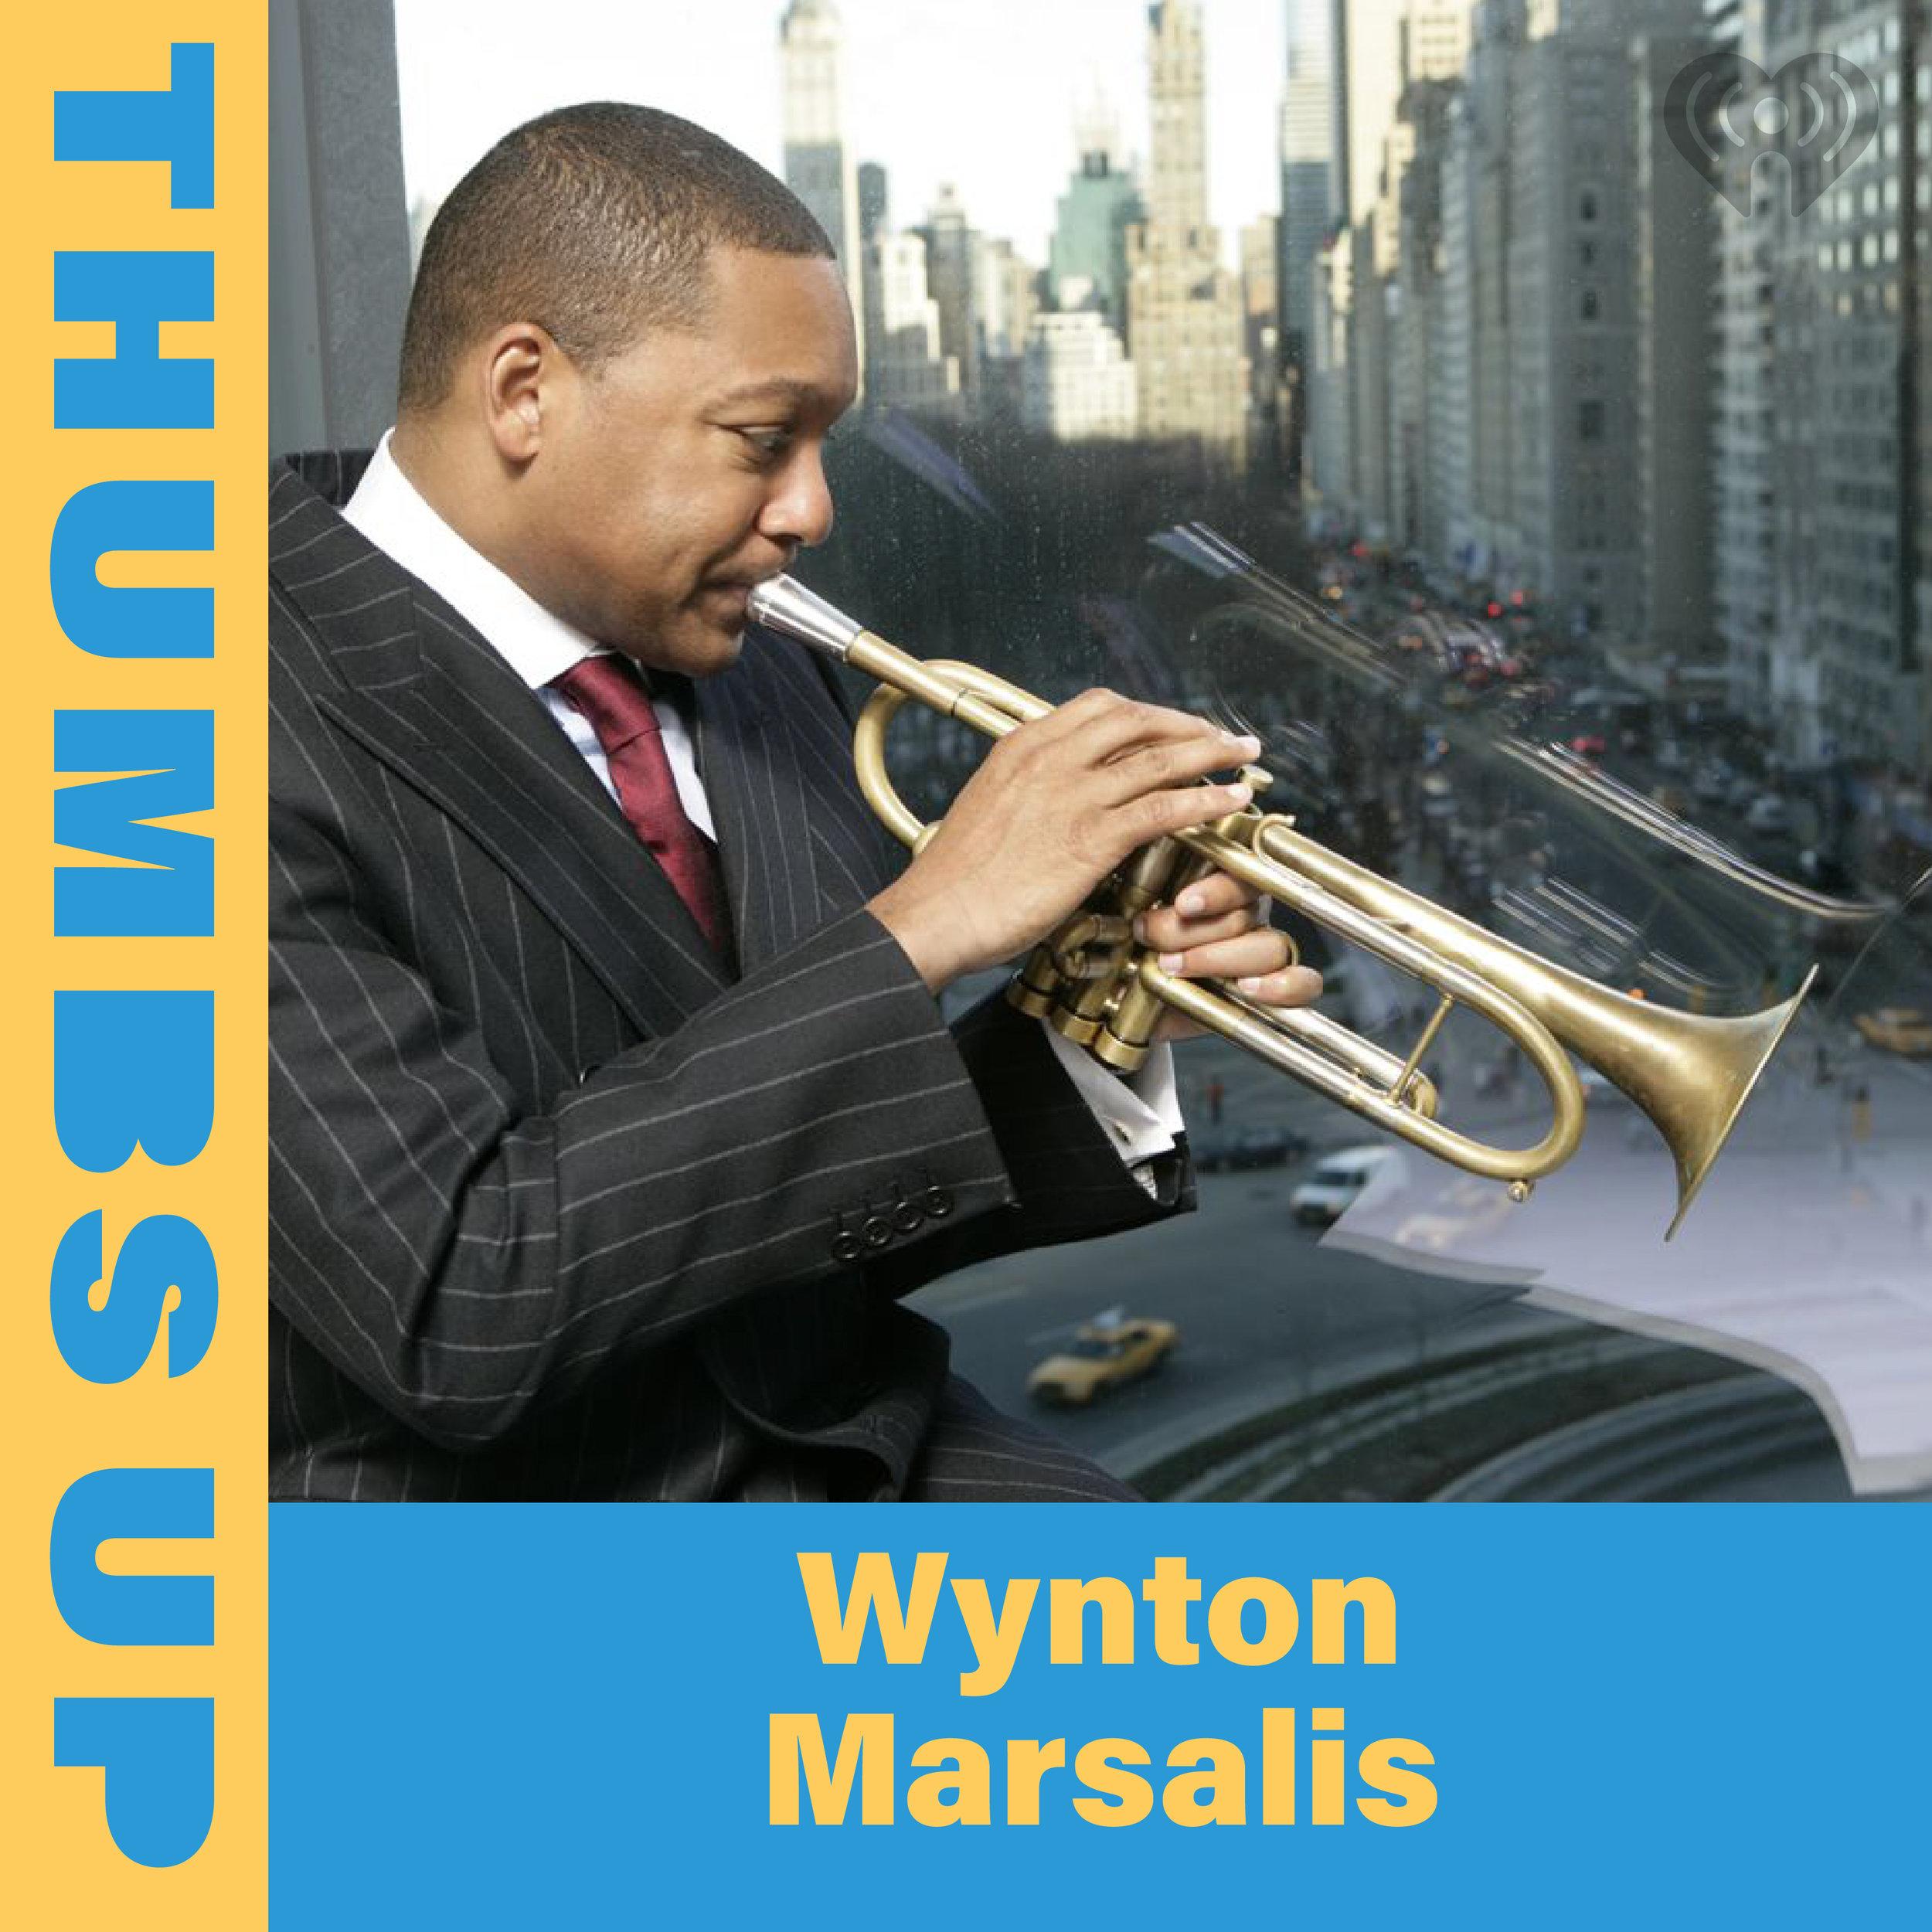 https://www.iheart.com/playlist/thumbs-up-wynton-marsalis-312064750-PRuK3wJPSJQ4epiiydYDid/